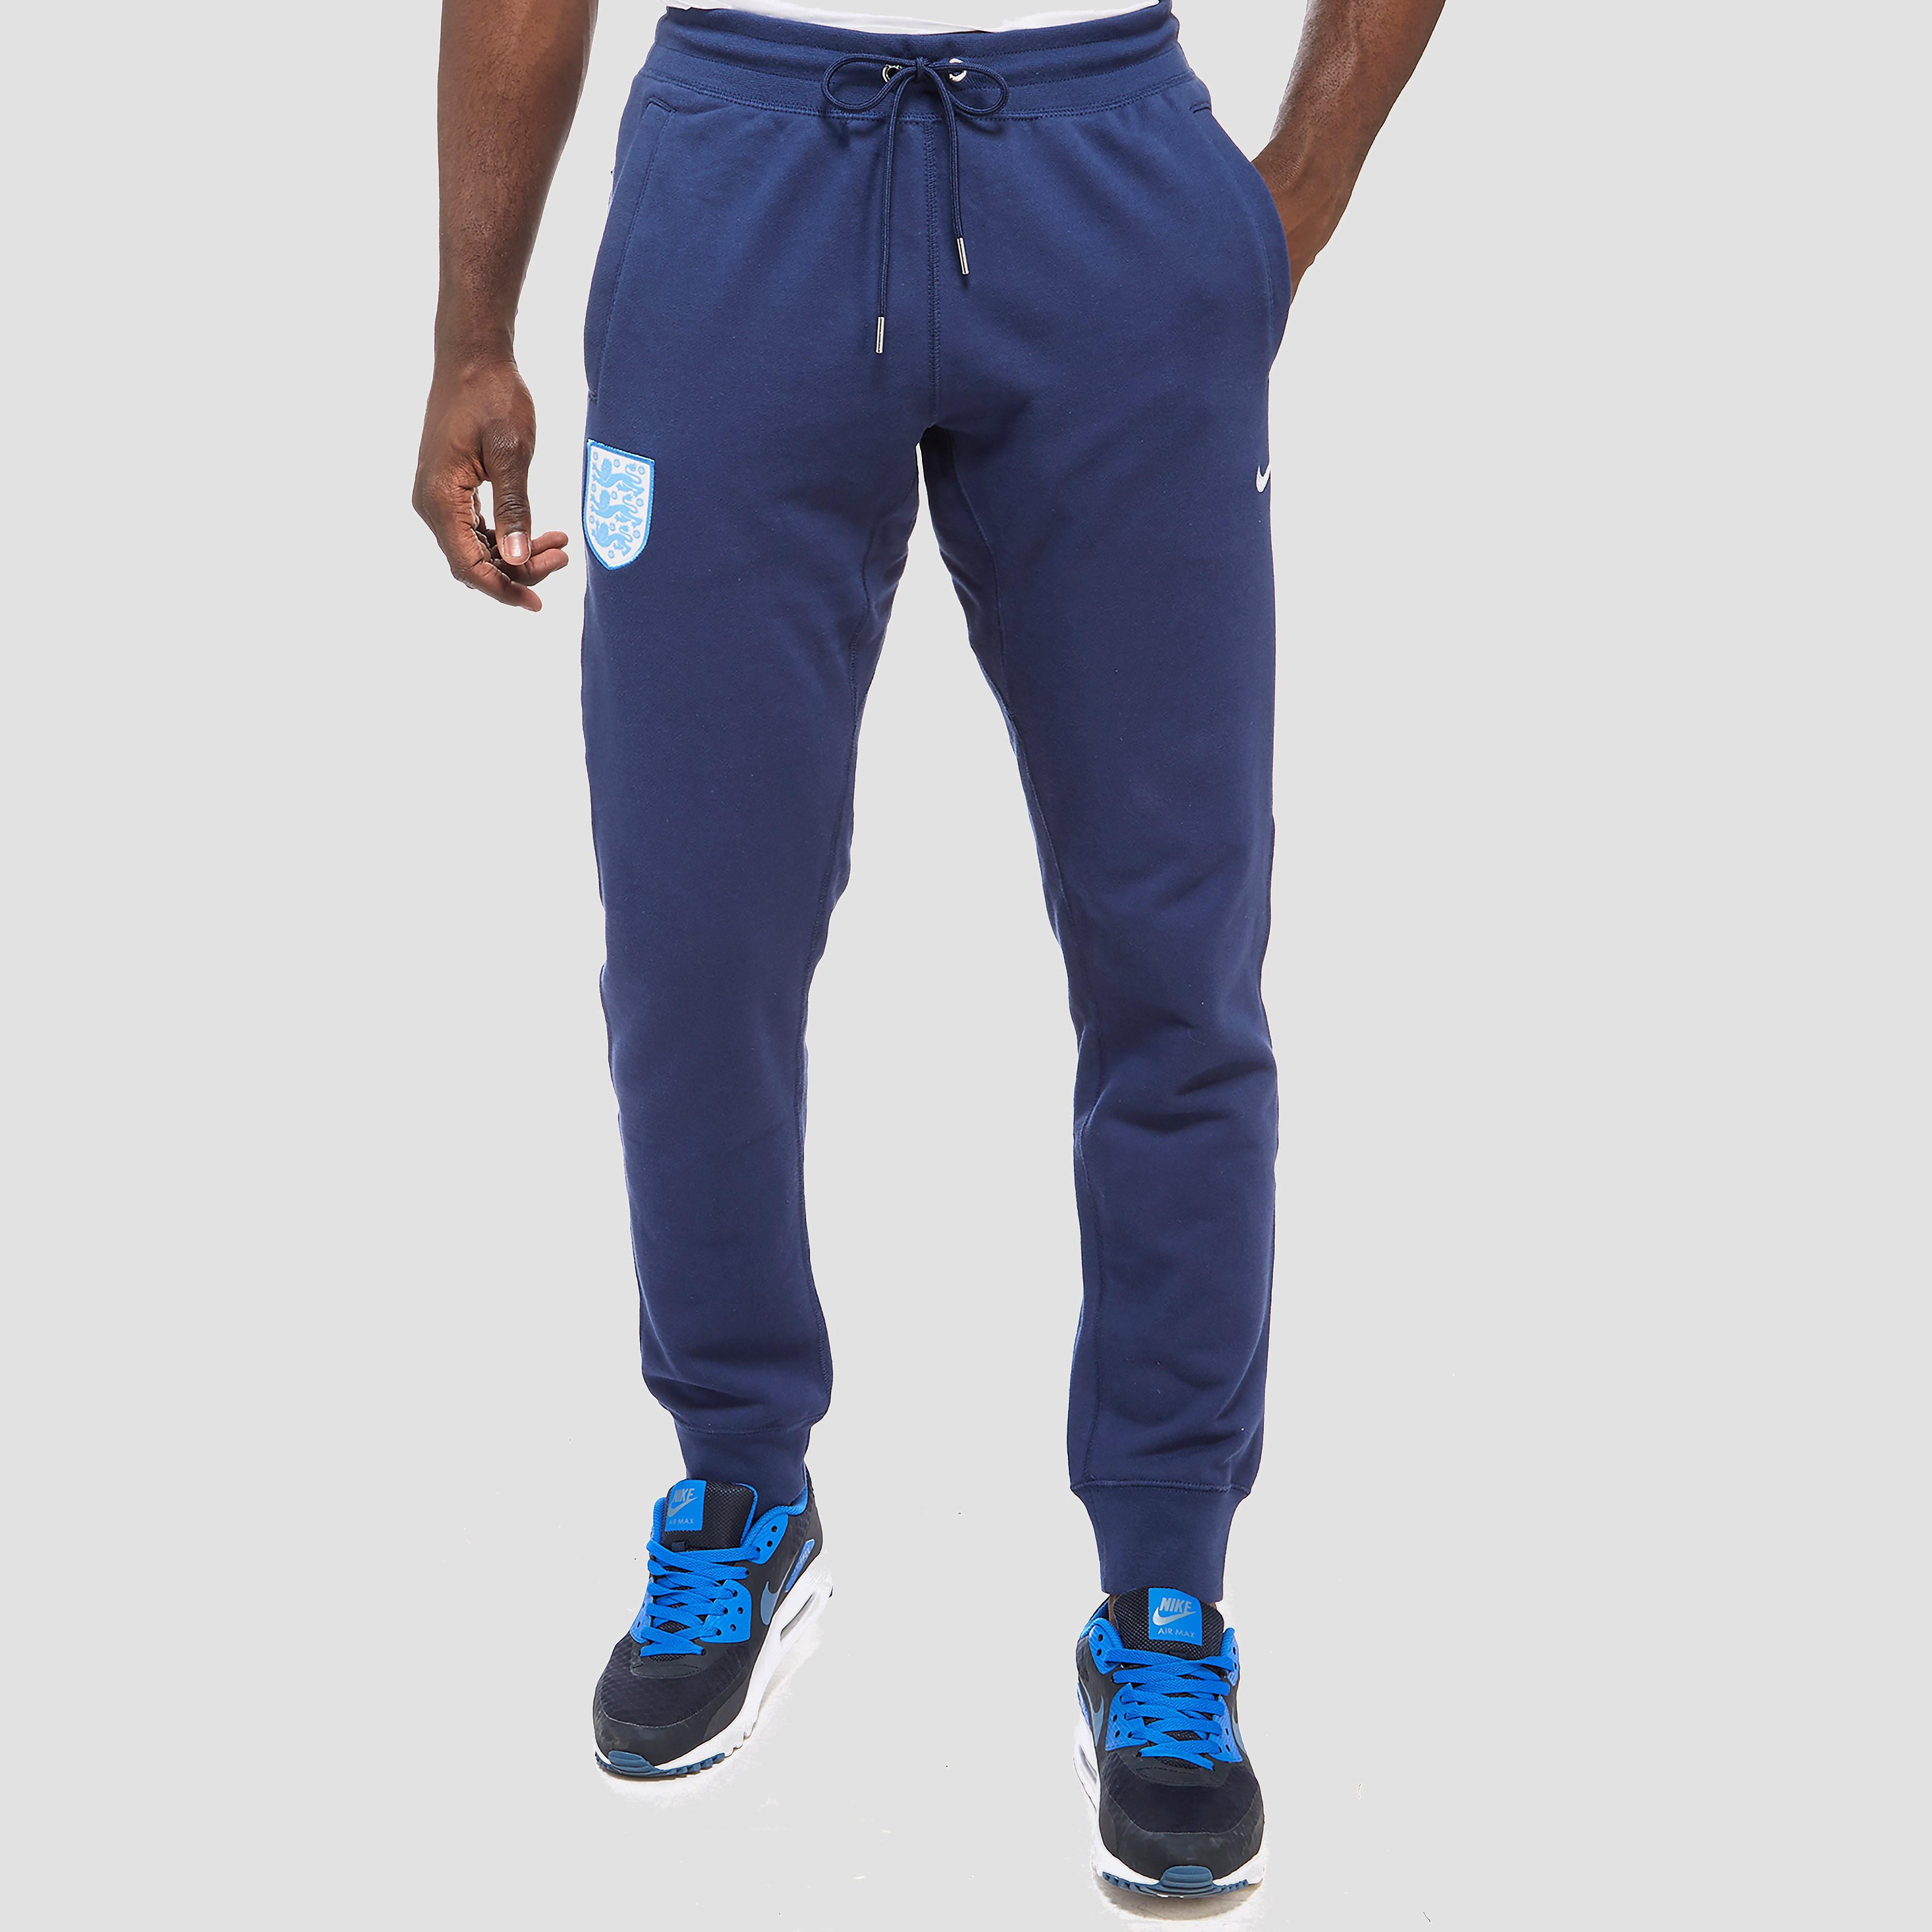 Nike England 2017 Authentic Men's Joggers